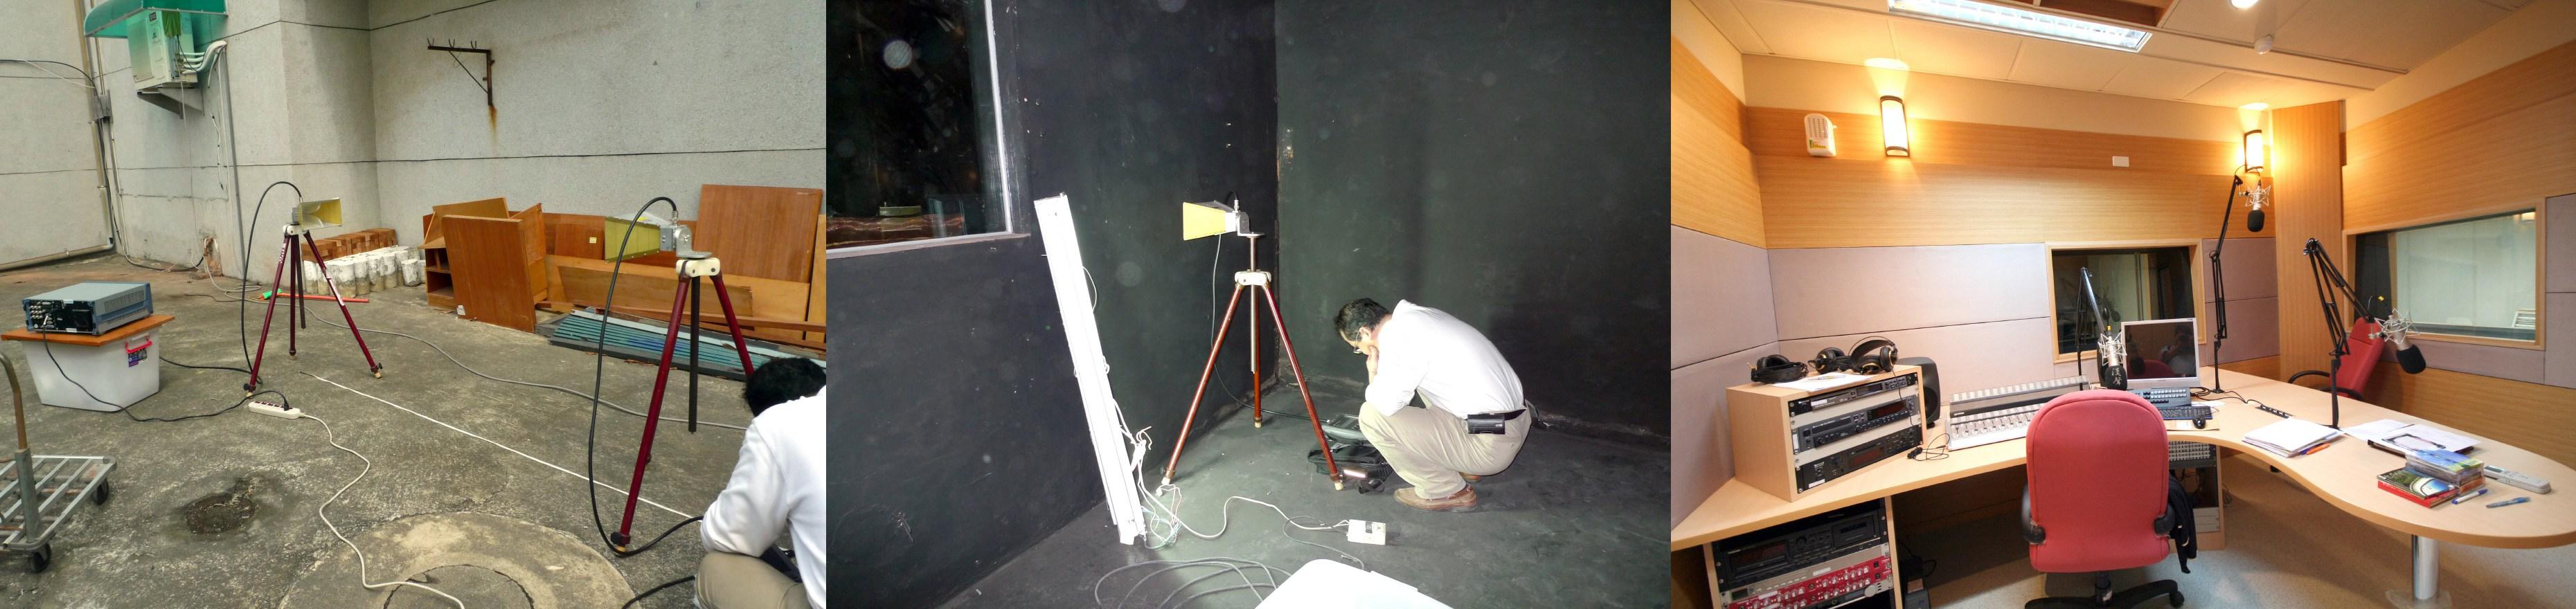 Recording studio uses RF Paint to optimize sound quality